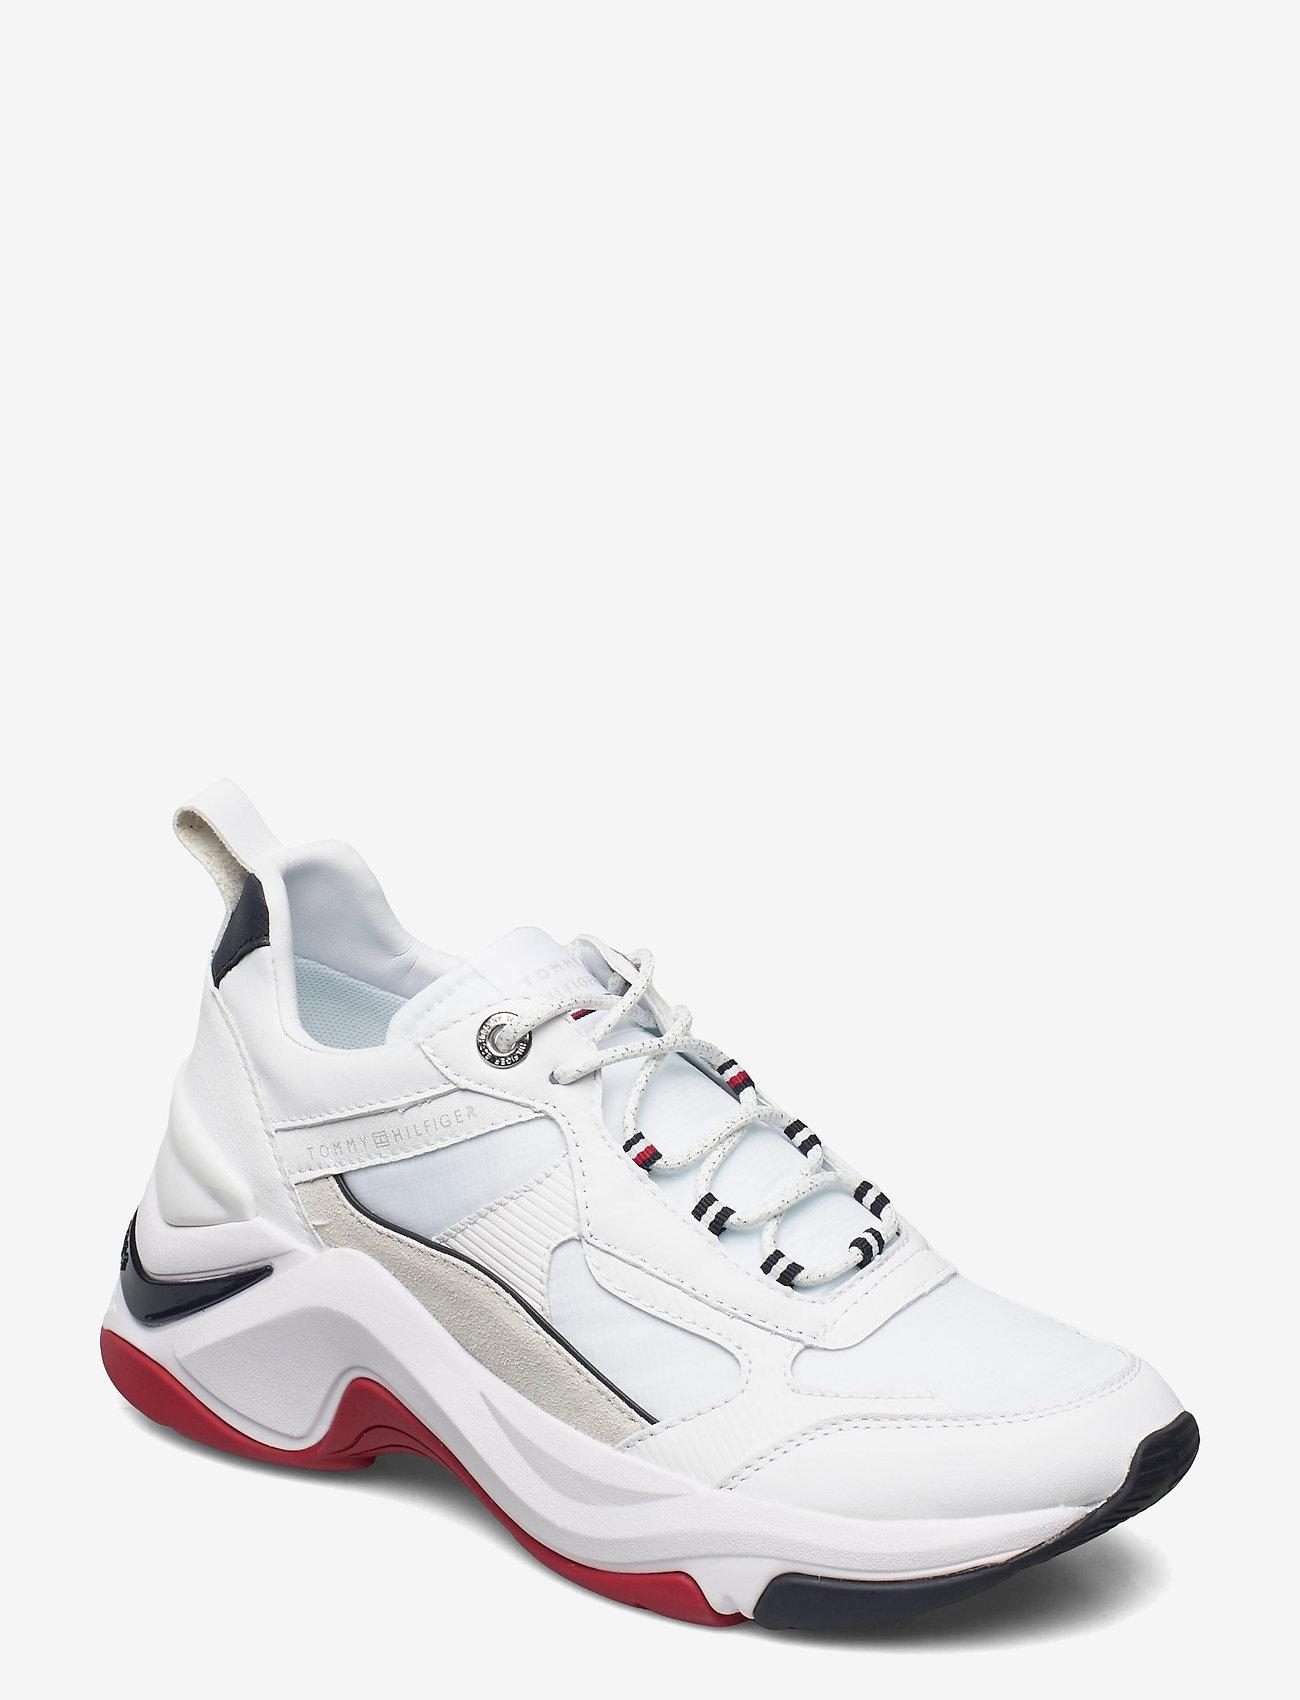 Tommy Hilfiger - FASHION WEDGE SNEAKER - sneakers - rwb - 0